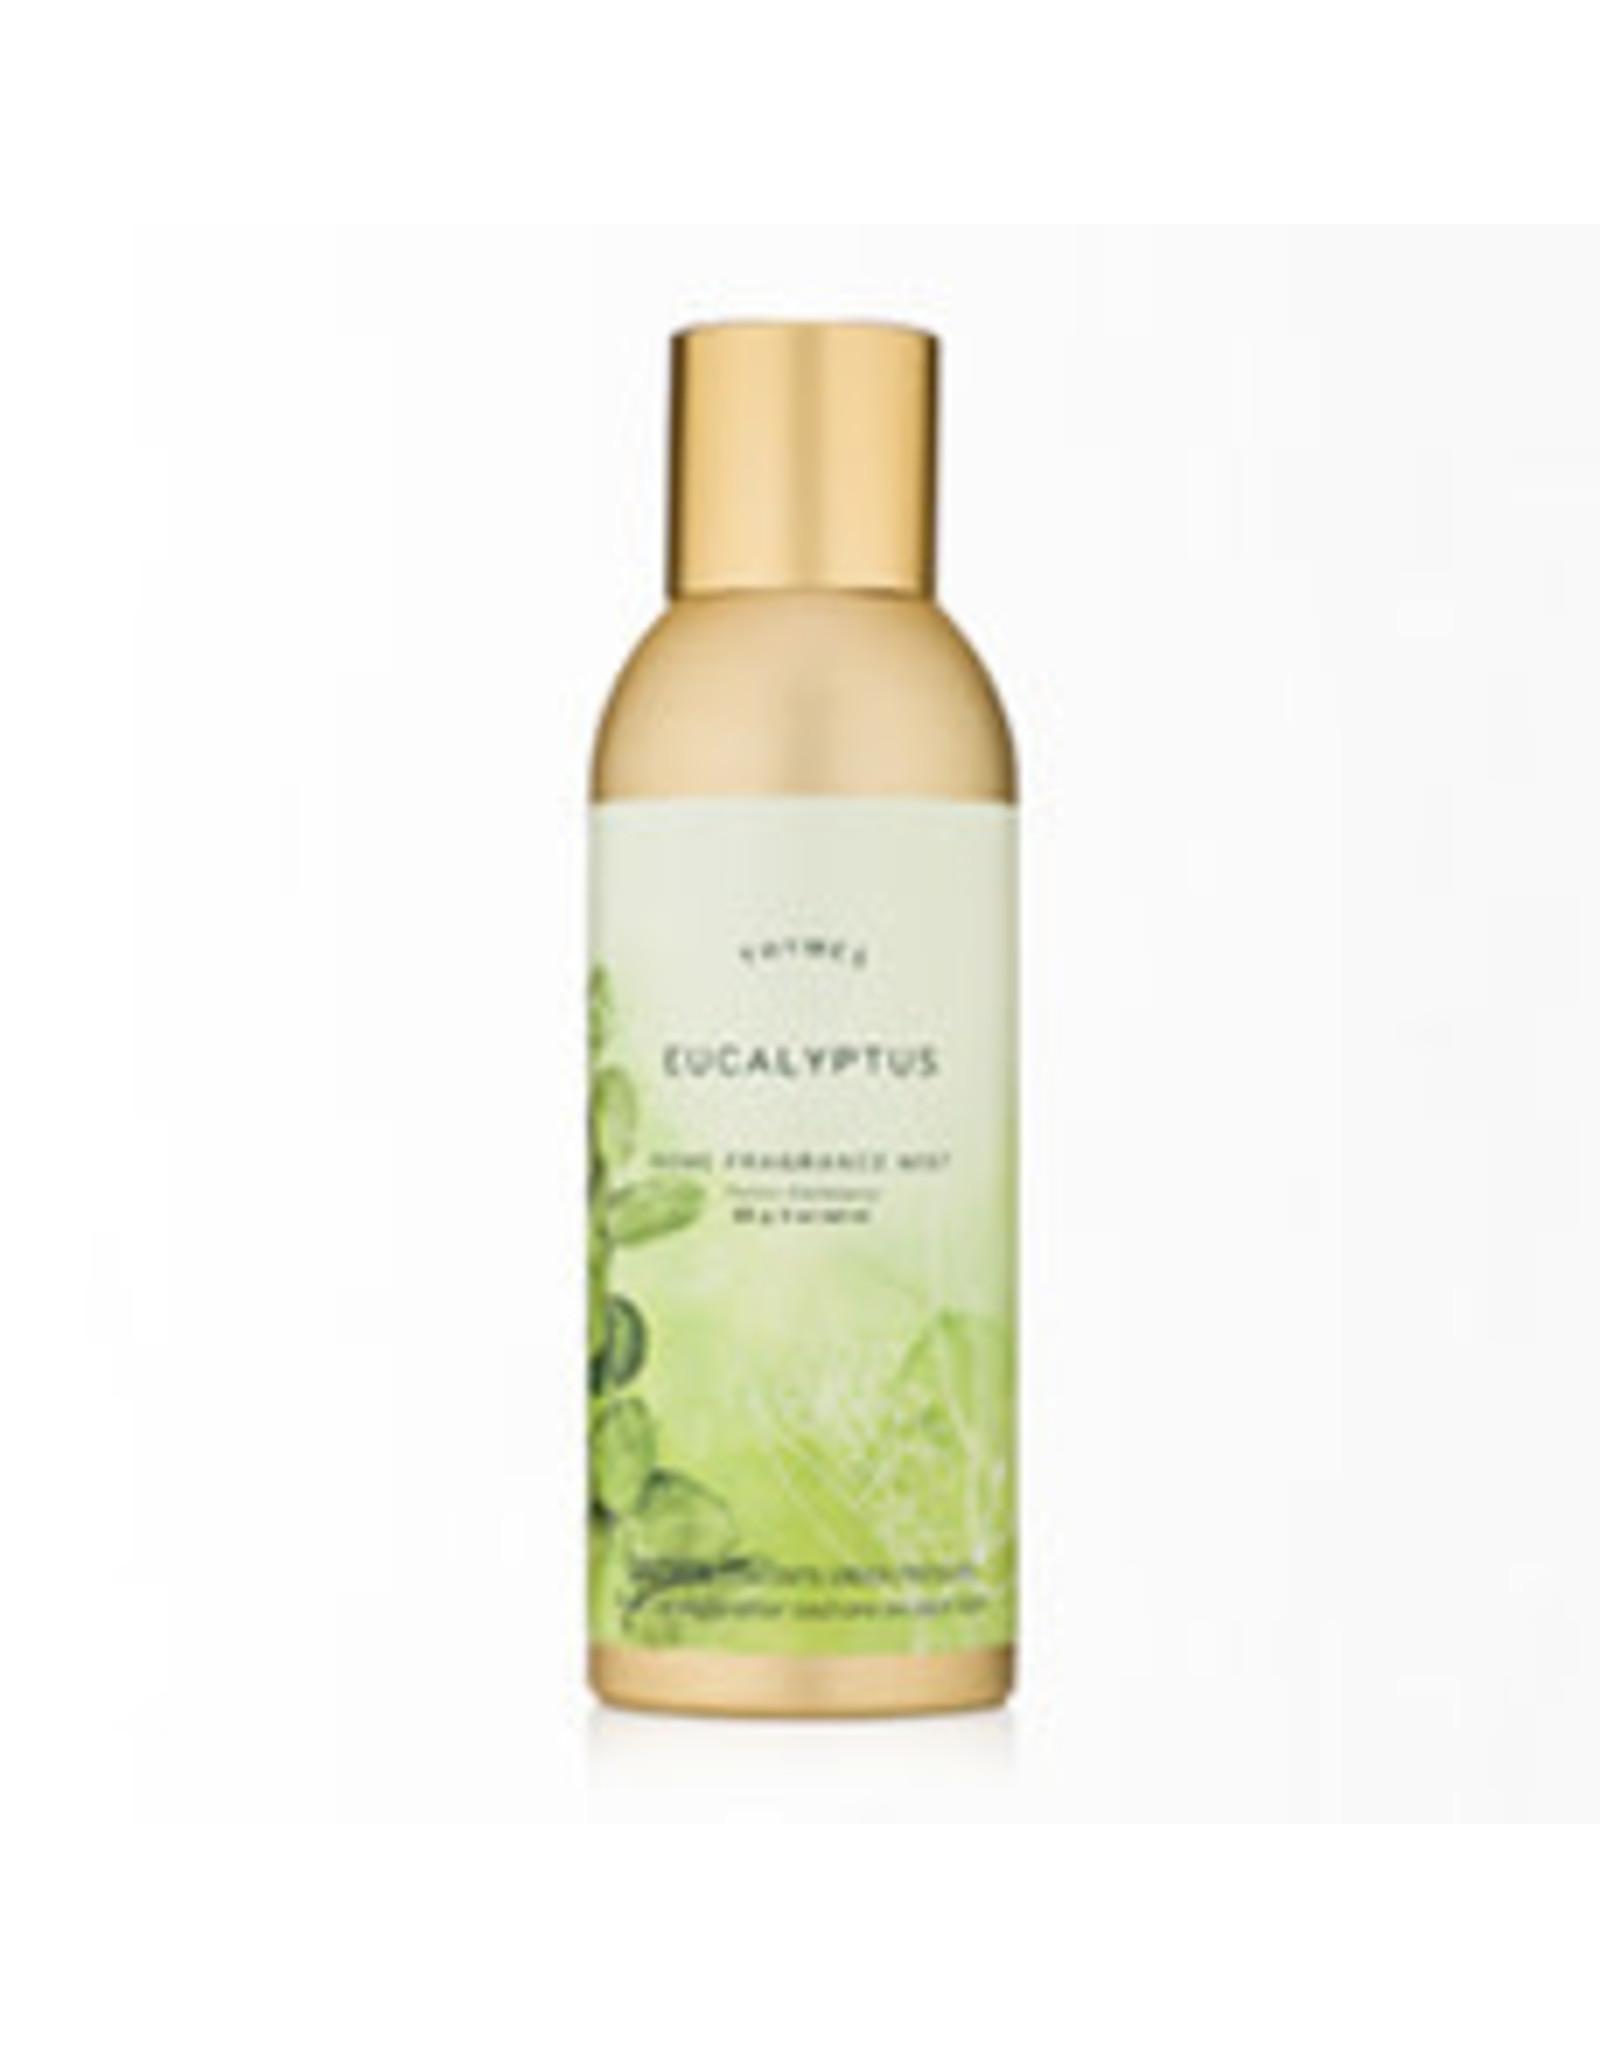 Thymes Eucalyptus Home Fragrance